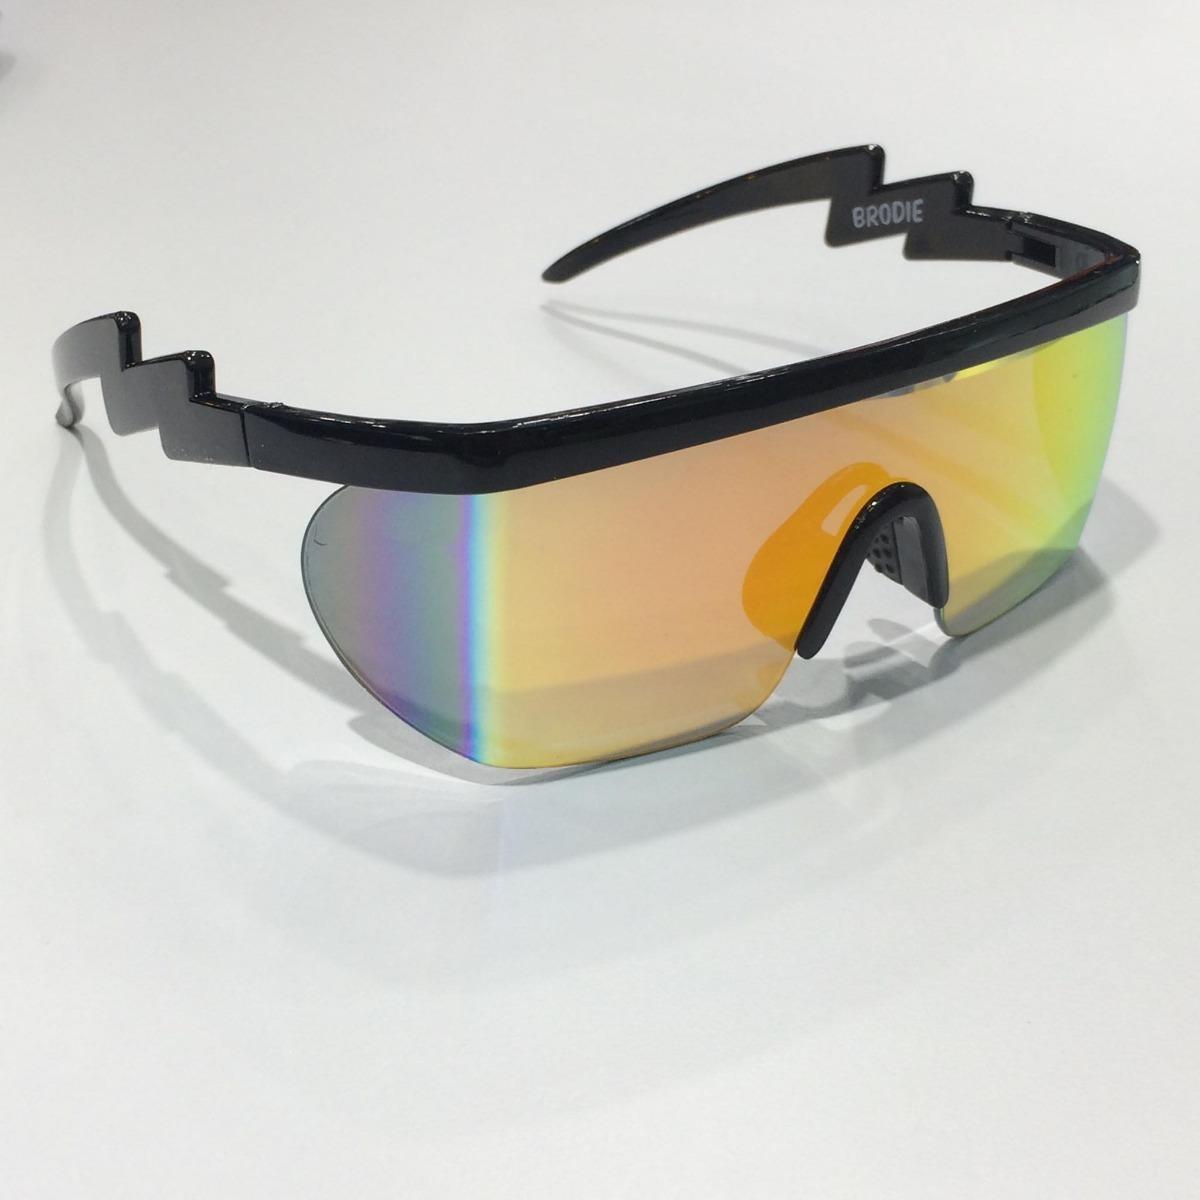 1ff727db7a gafas de sol simil neff brodie doble retro vintage anteojos. Cargando zoom.